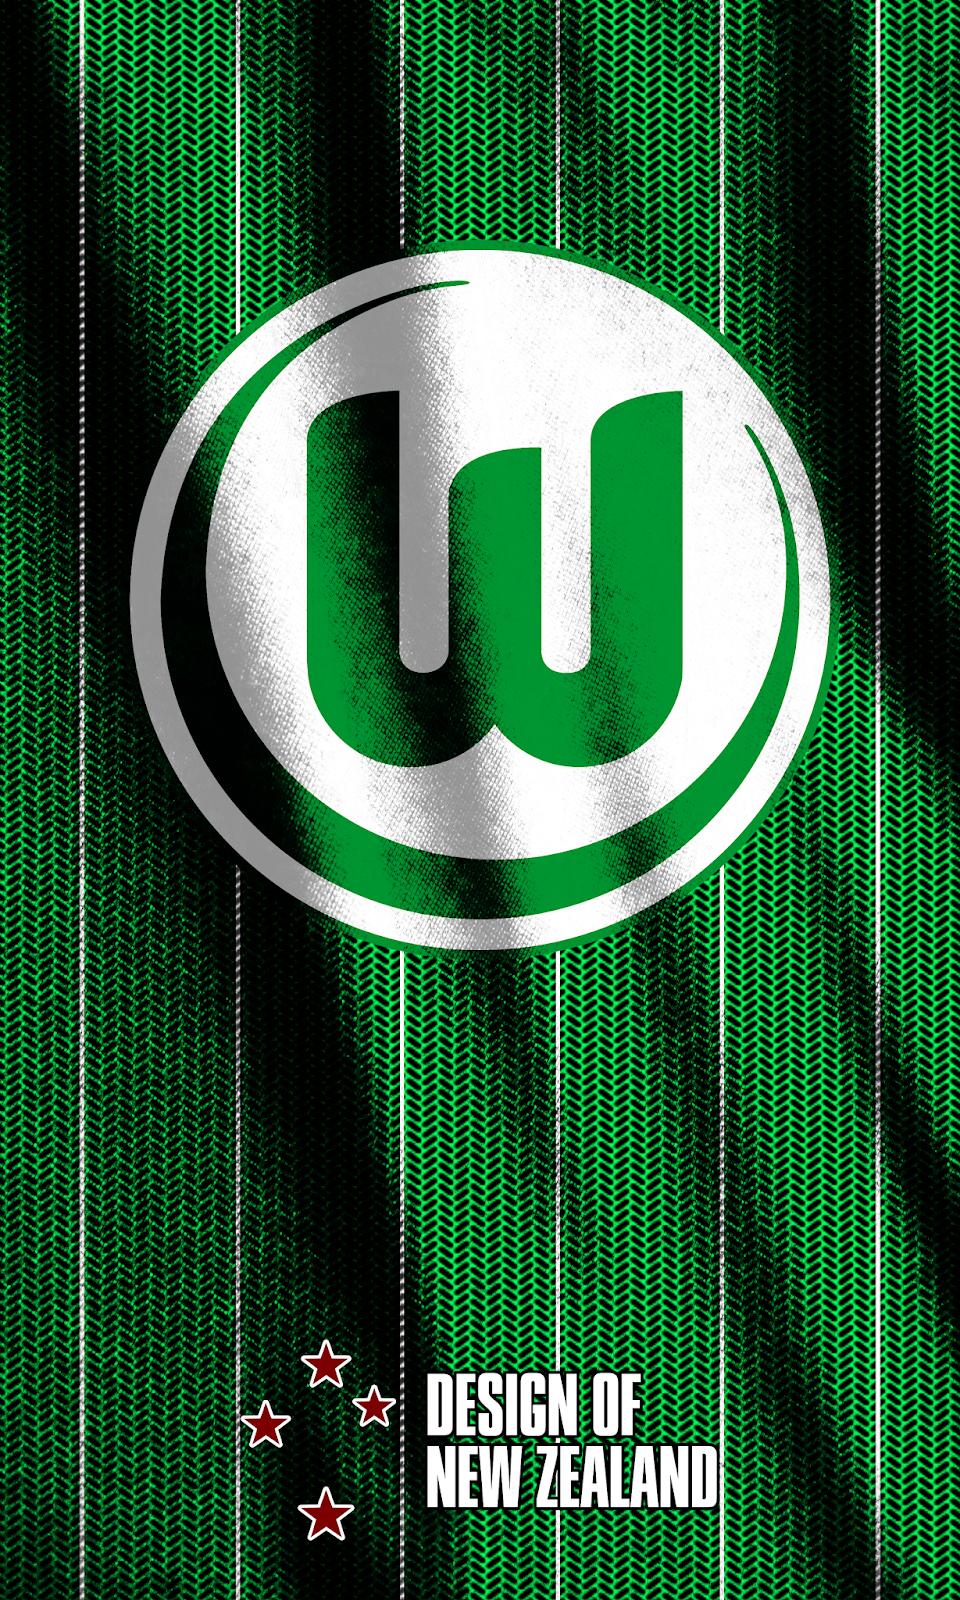 Free Download Wallpaper Vfl Wolfsburg The One God Vfl Wolfsburg Soccer 960x1600 For Your Desktop Mobile Tablet Explore 20 Vfl Wolfsburgo Wallpapers Vfl Wolfsburgo Wallpapers